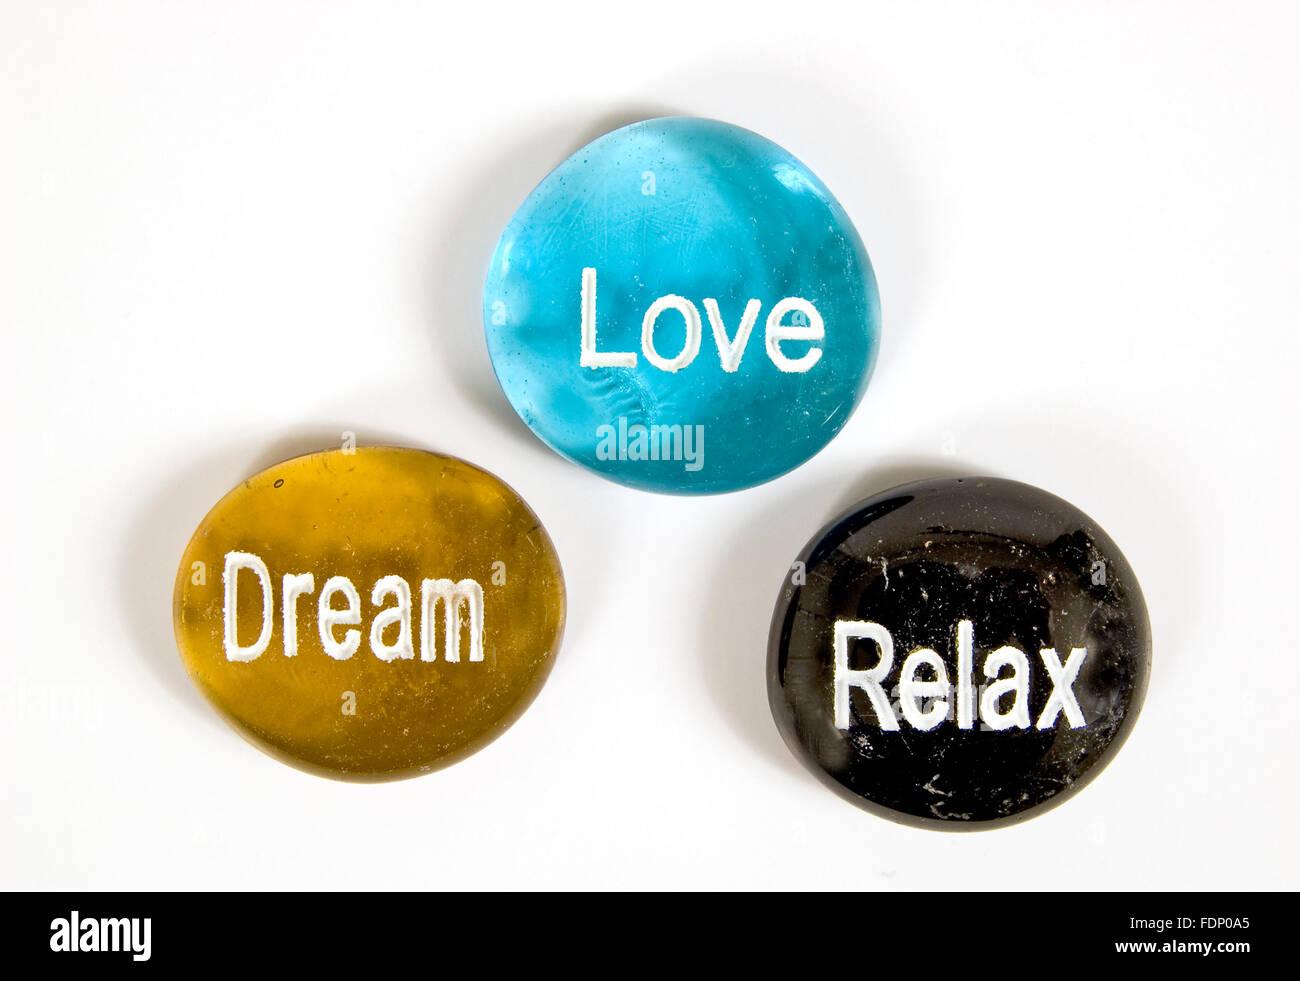 Dream Love Relax Encouragement Stones on White Background - Stock Image